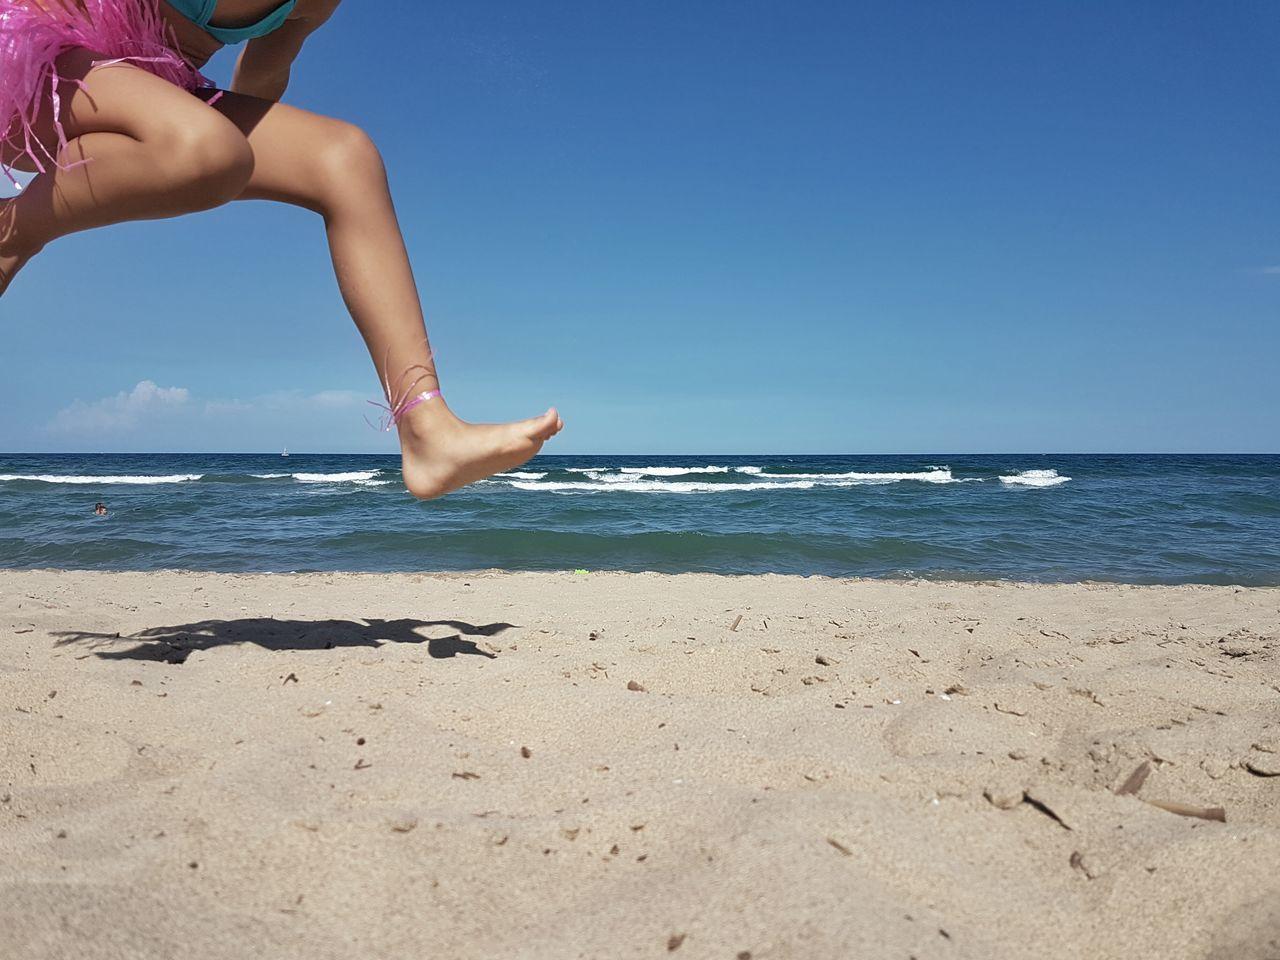 Jump Jumping Sea Water Sand Beach Blue Sicily Landscape Beach Photography Child At The Beach Enjoying Life Enjoying The Sun